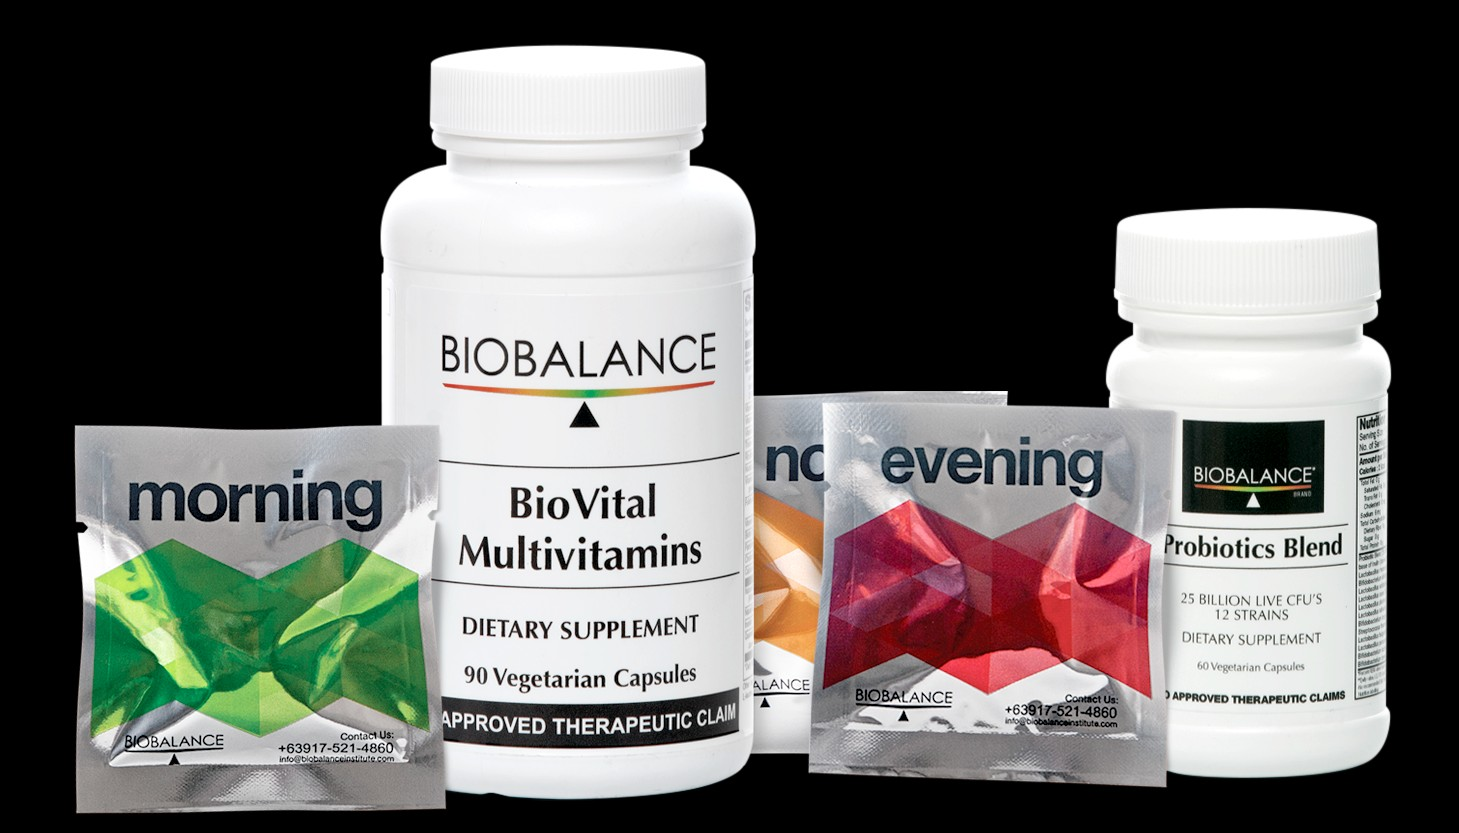 Biobalance 2